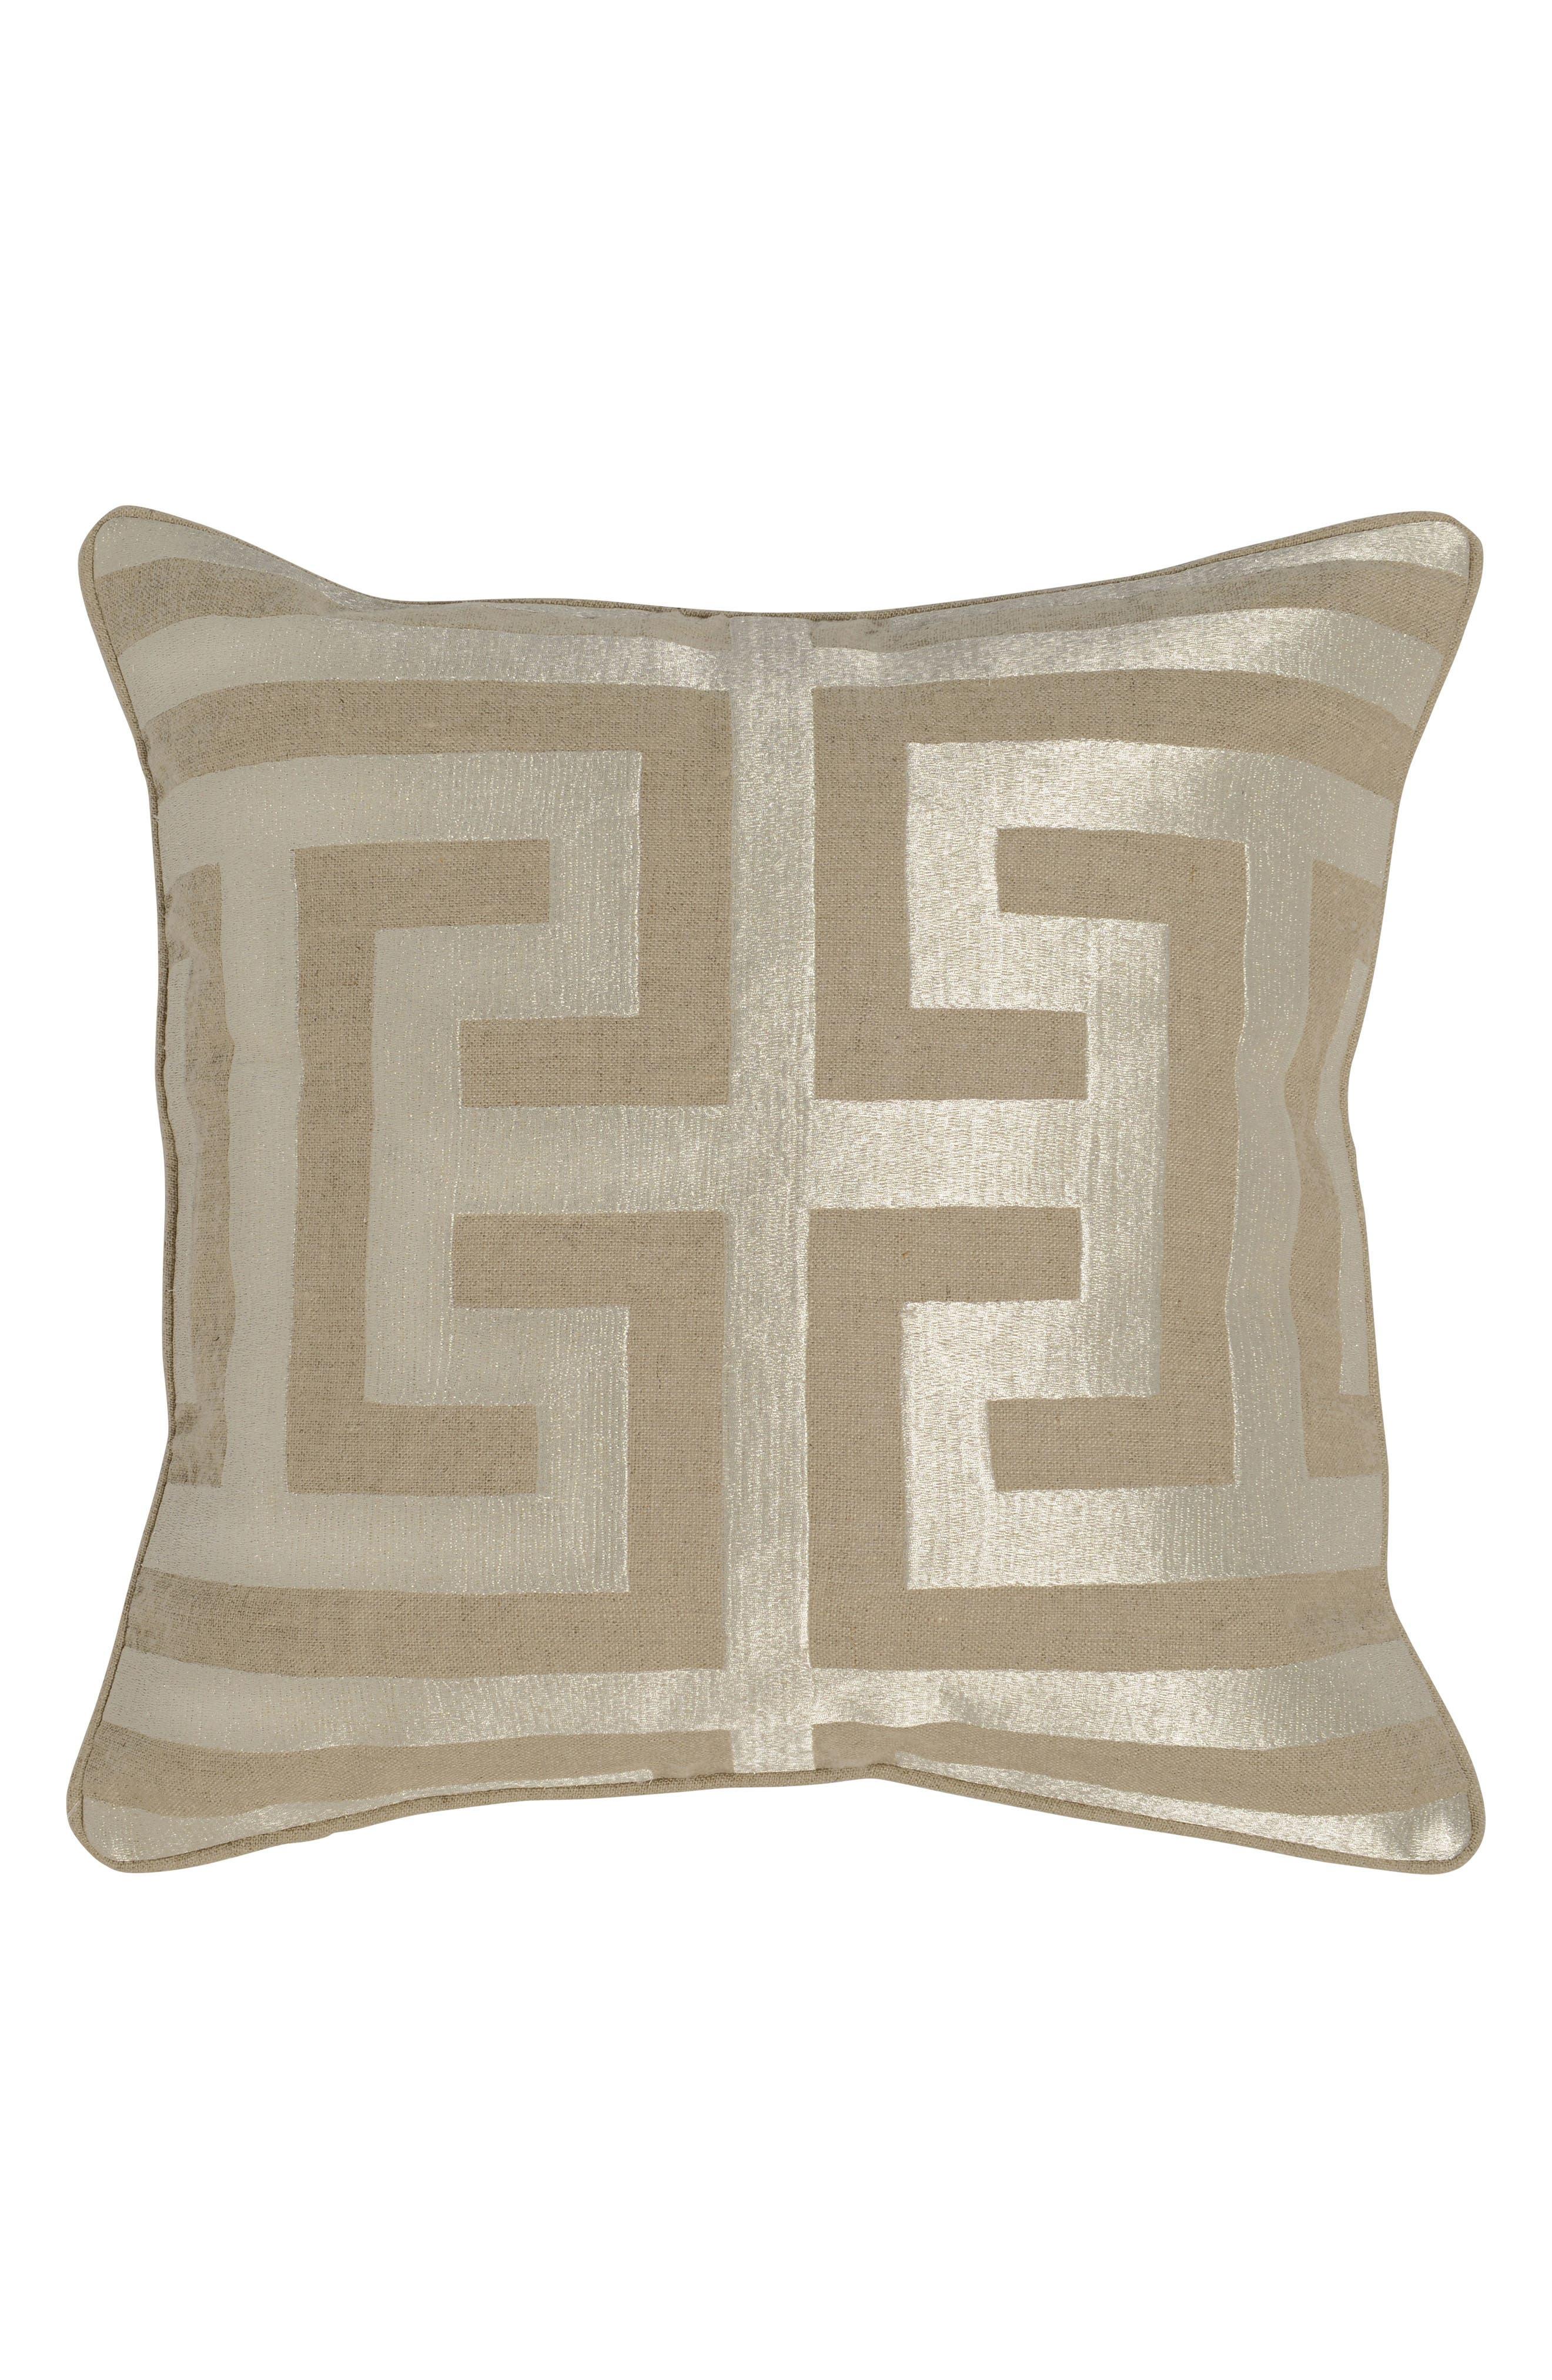 'Capital' Decorative Pillow,                             Main thumbnail 1, color,                             Natural/ Silver